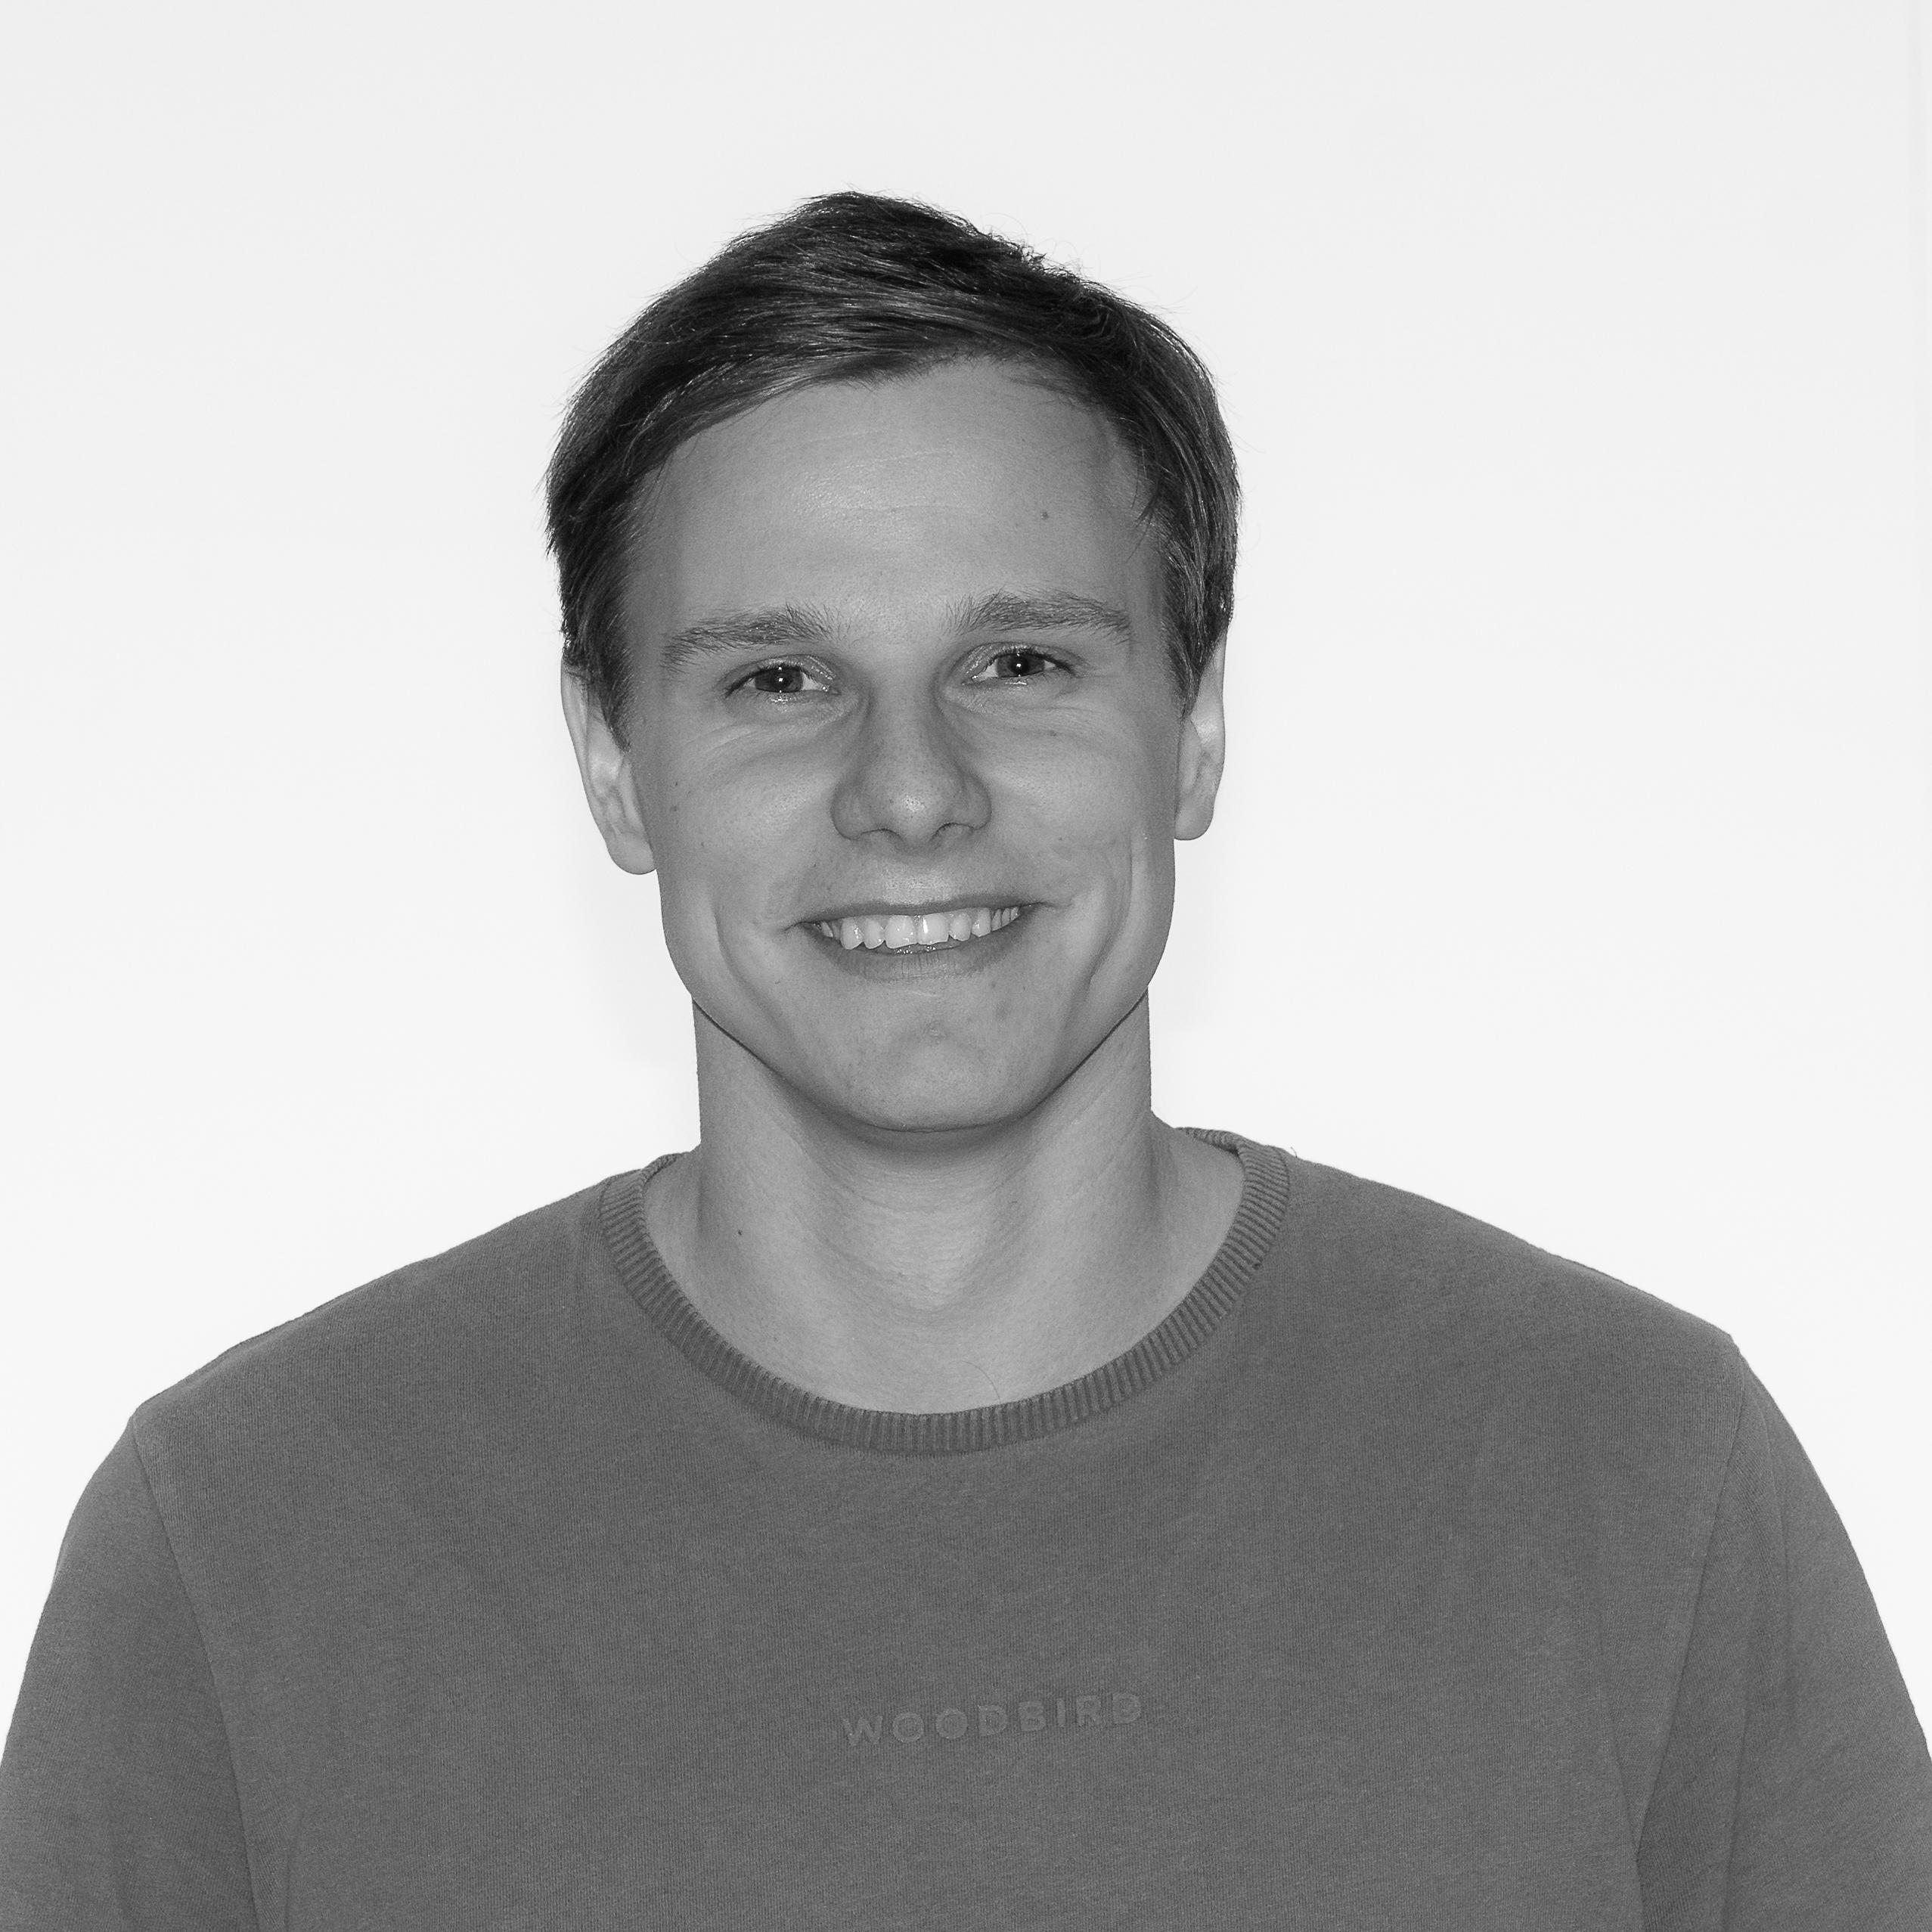 Kasper Meldgaard